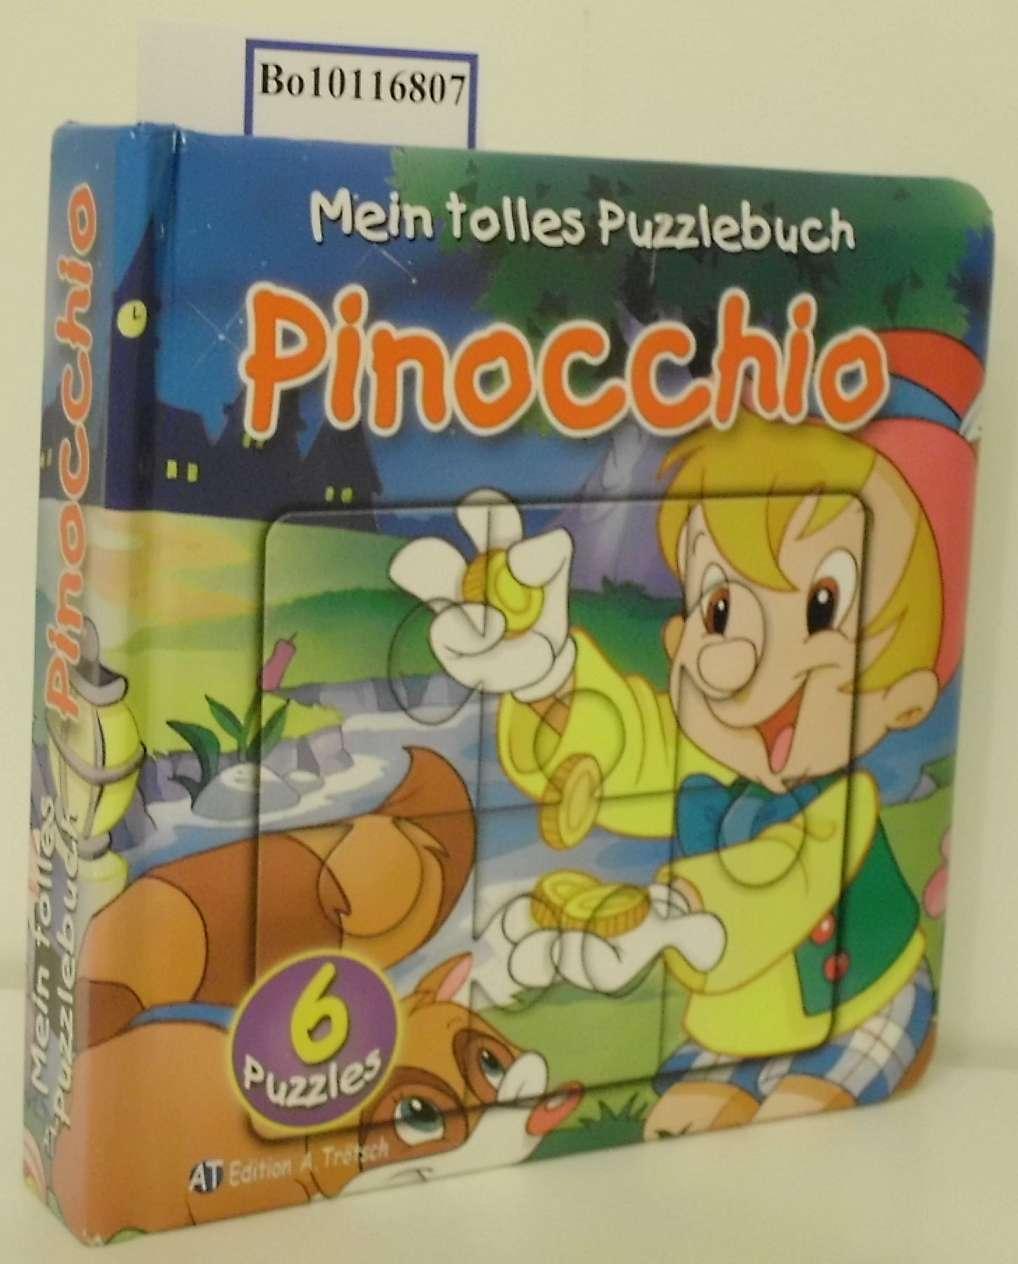 Mein tolles Puzzlebuch Pinocchio 6 Puzzles